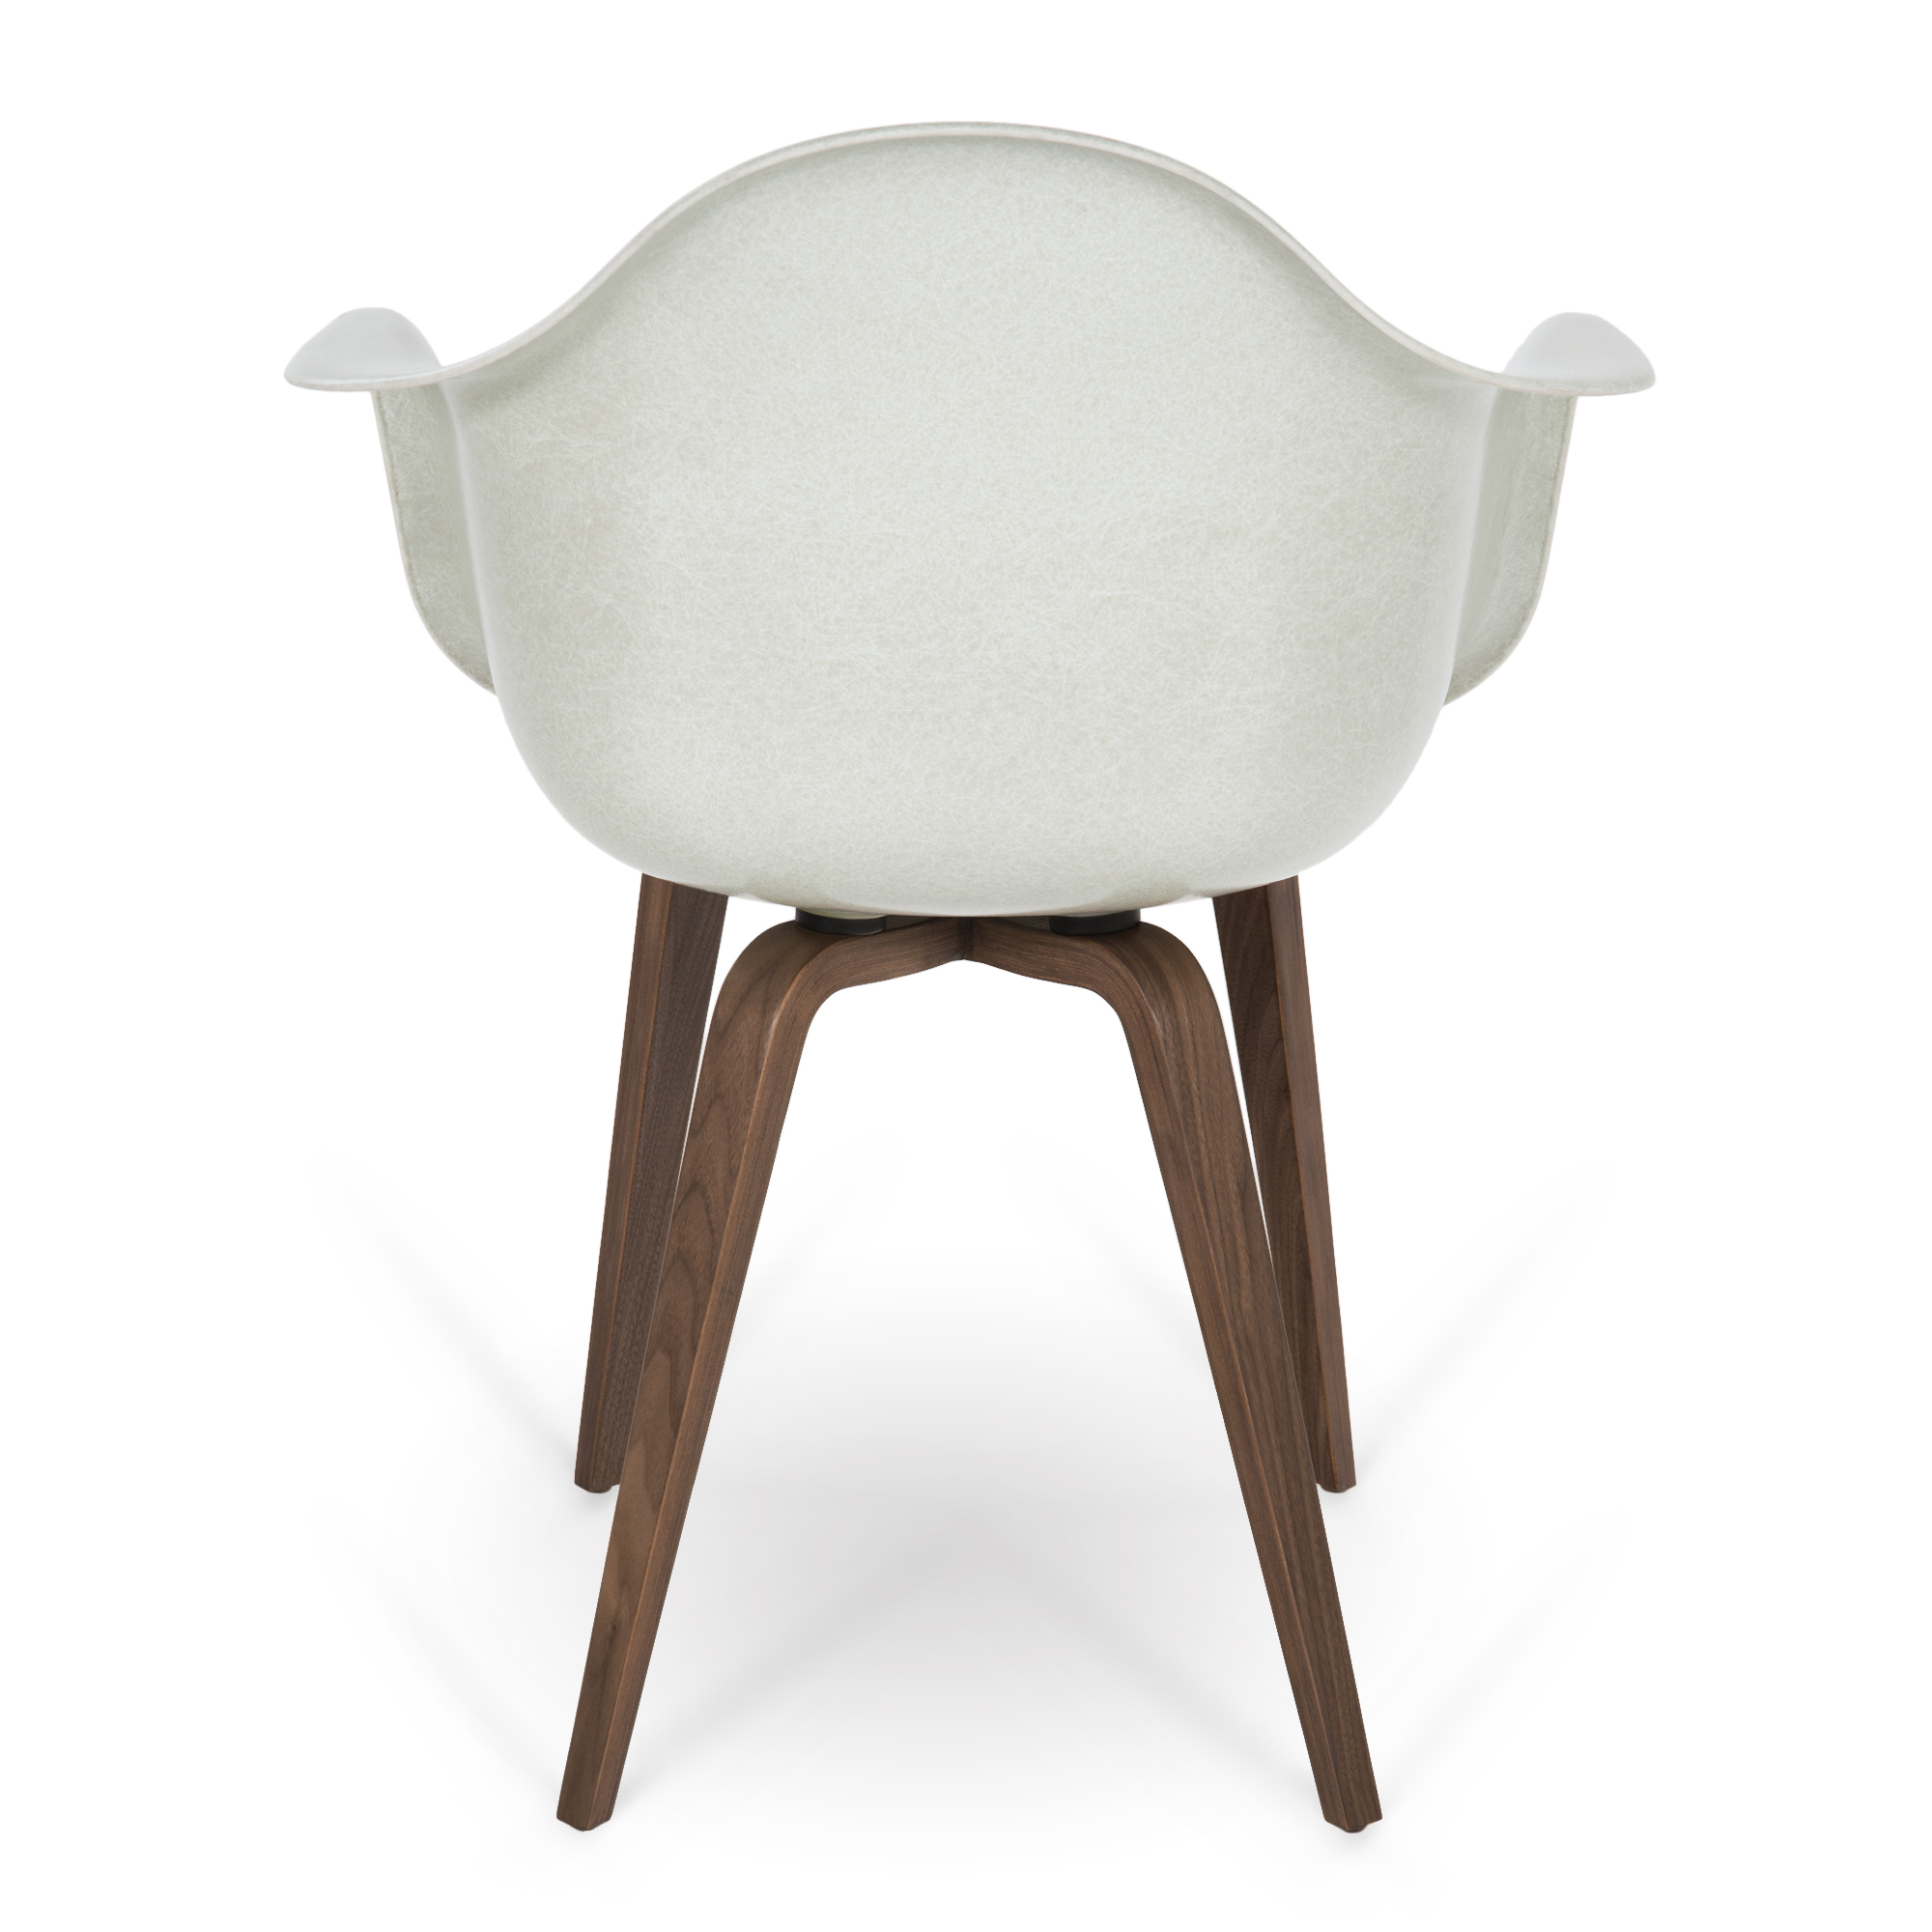 Modernica Case Study Arm Chair Shell Spyder